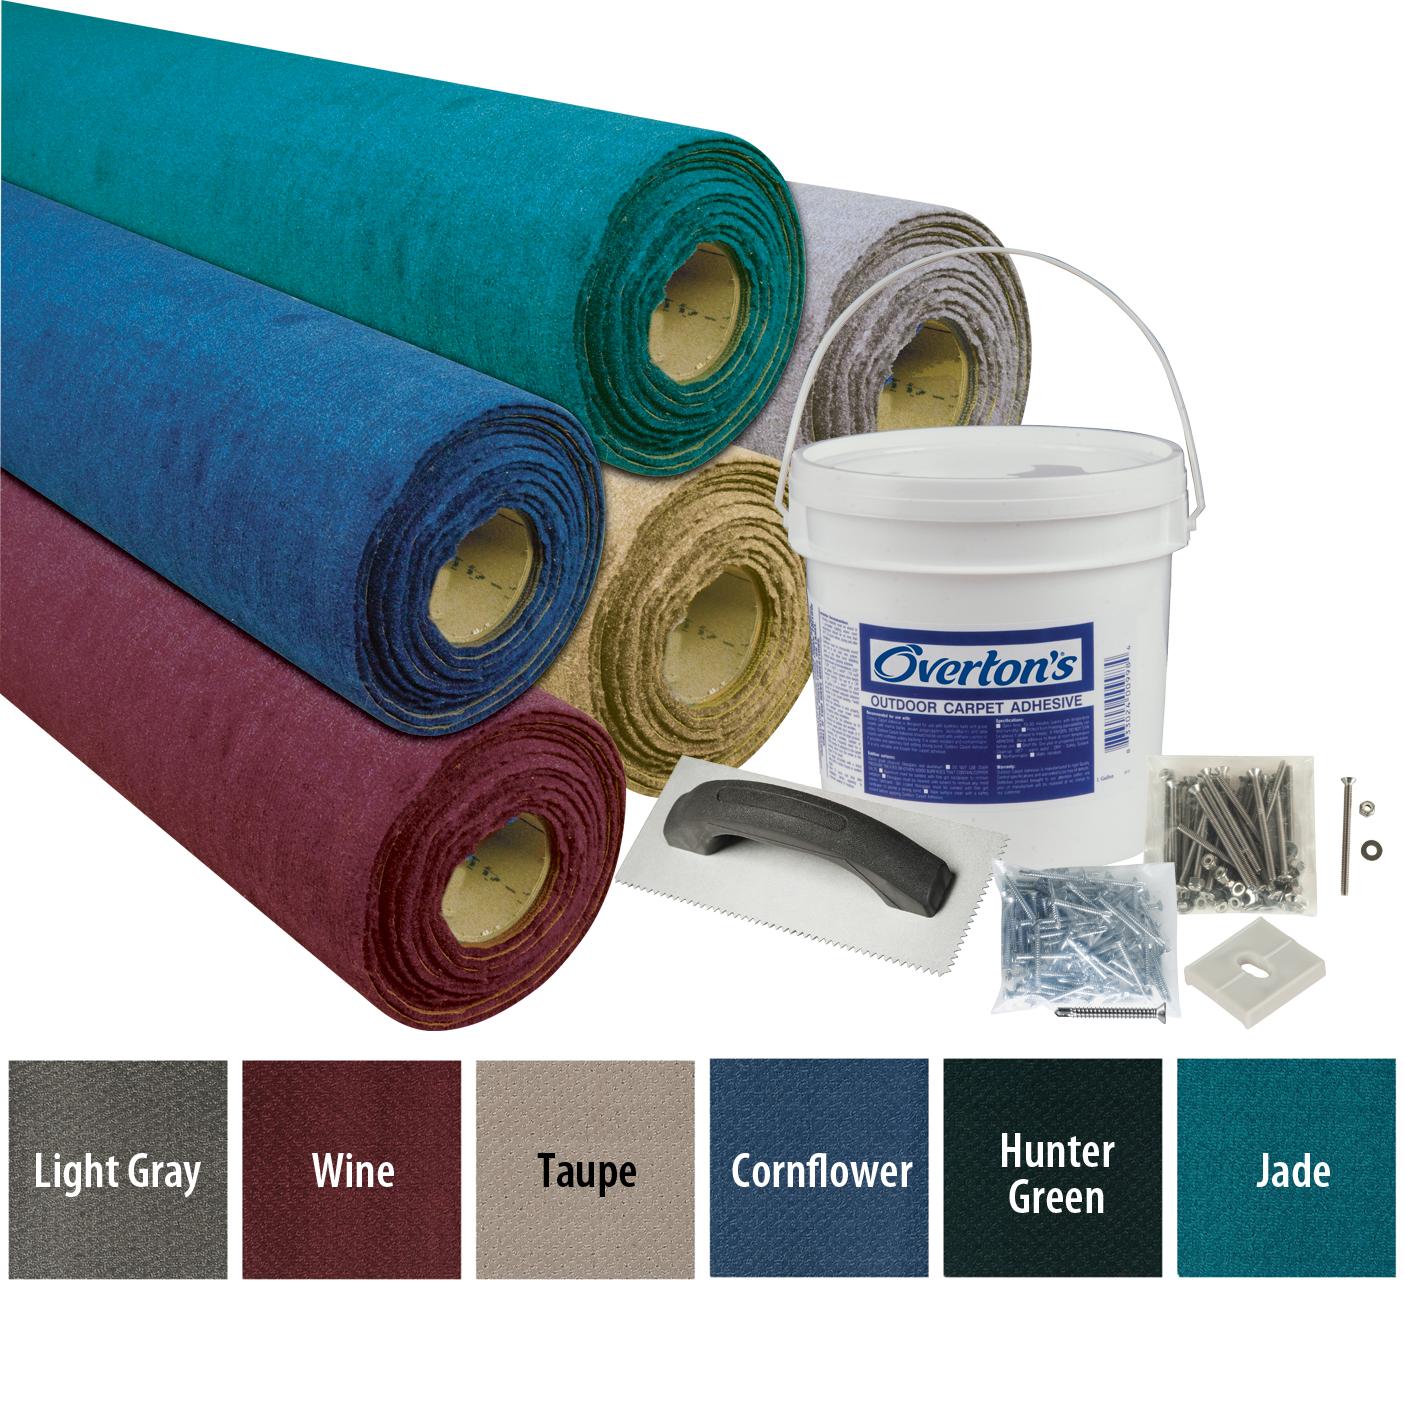 Overton's Sundance Carpet Kit, 8.5'W x 25'L